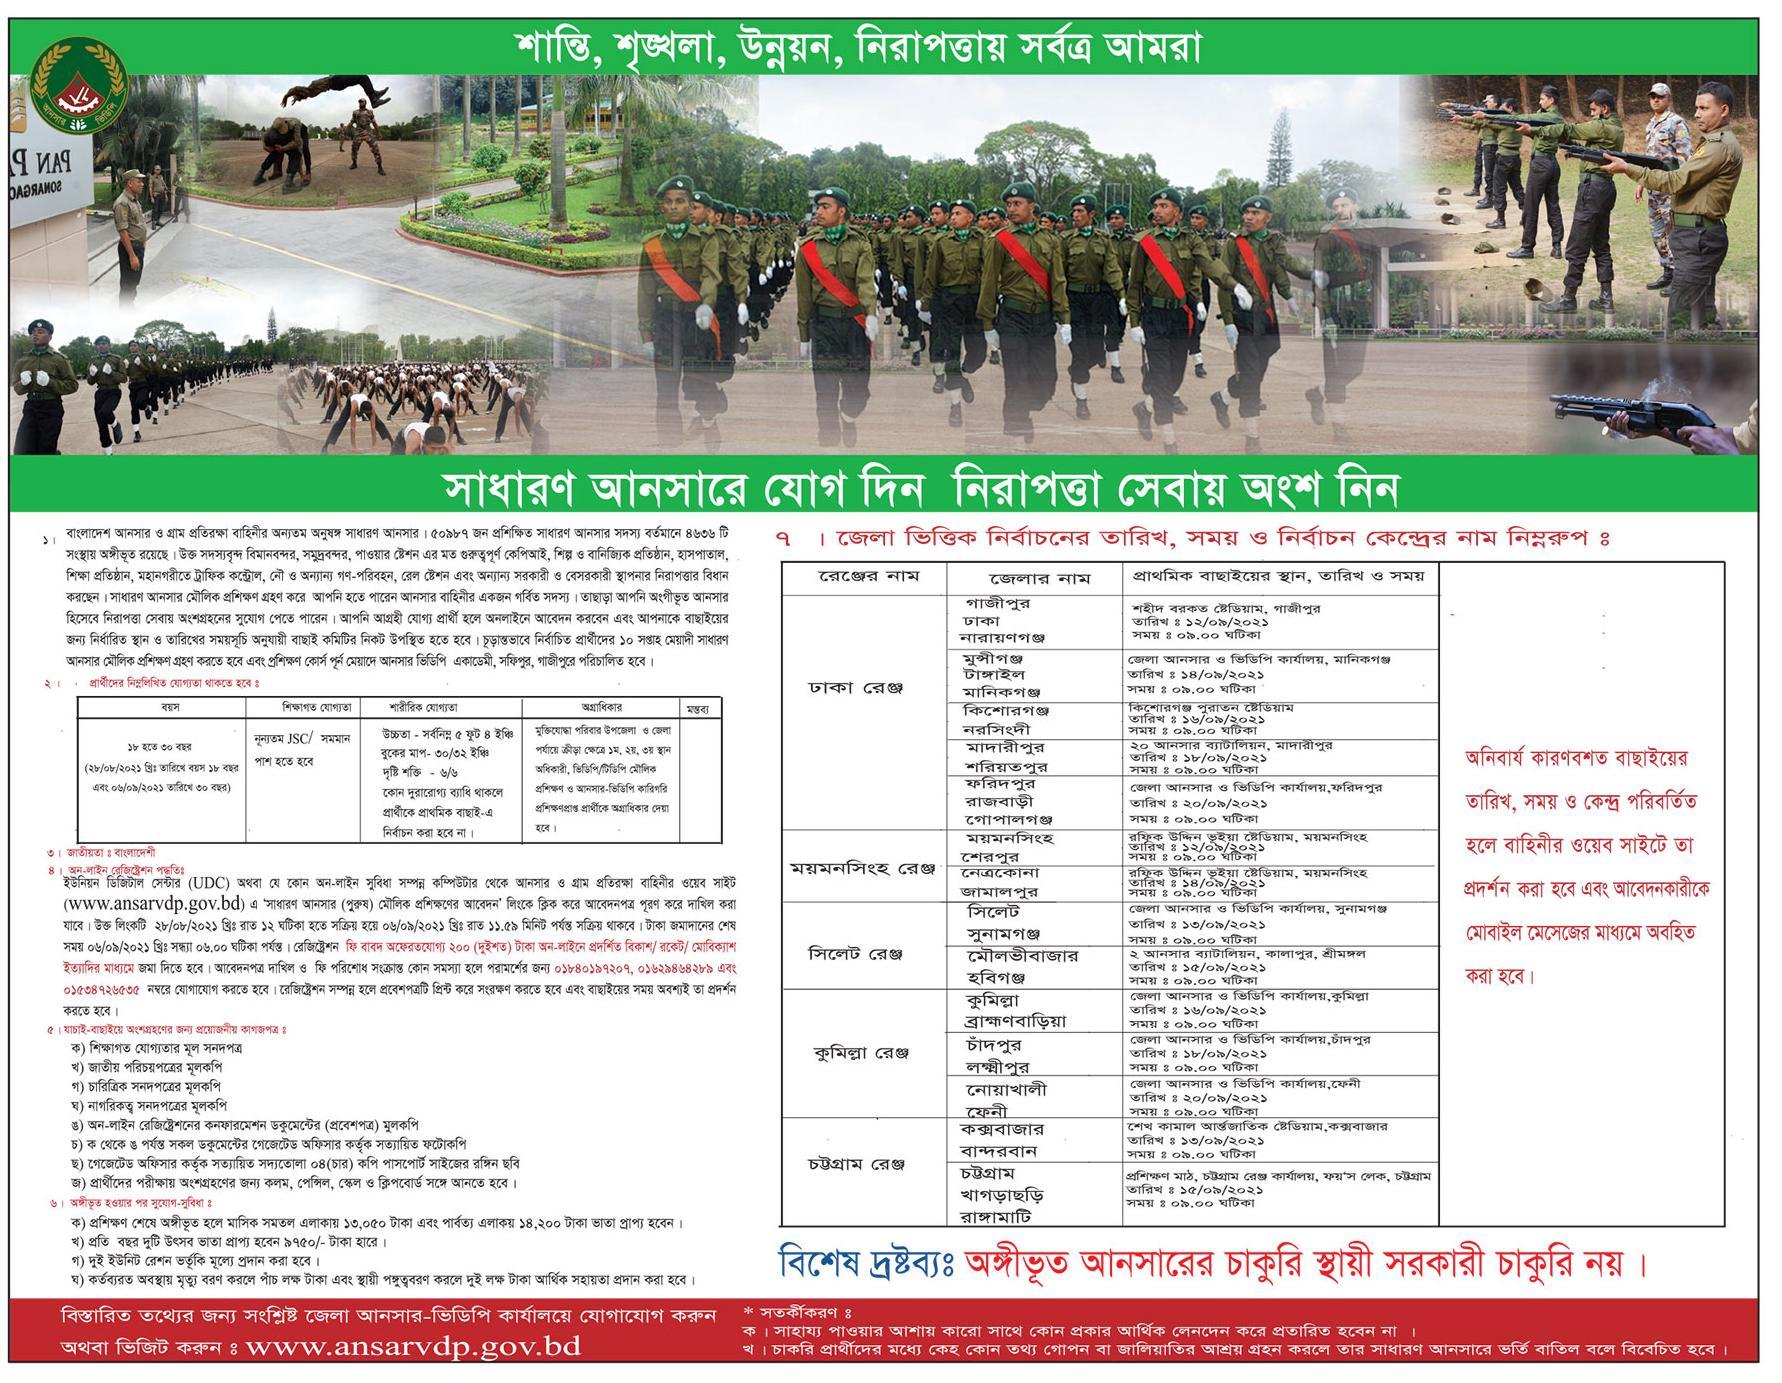 www.ansarvdp.gov.bd Job Circular 2021